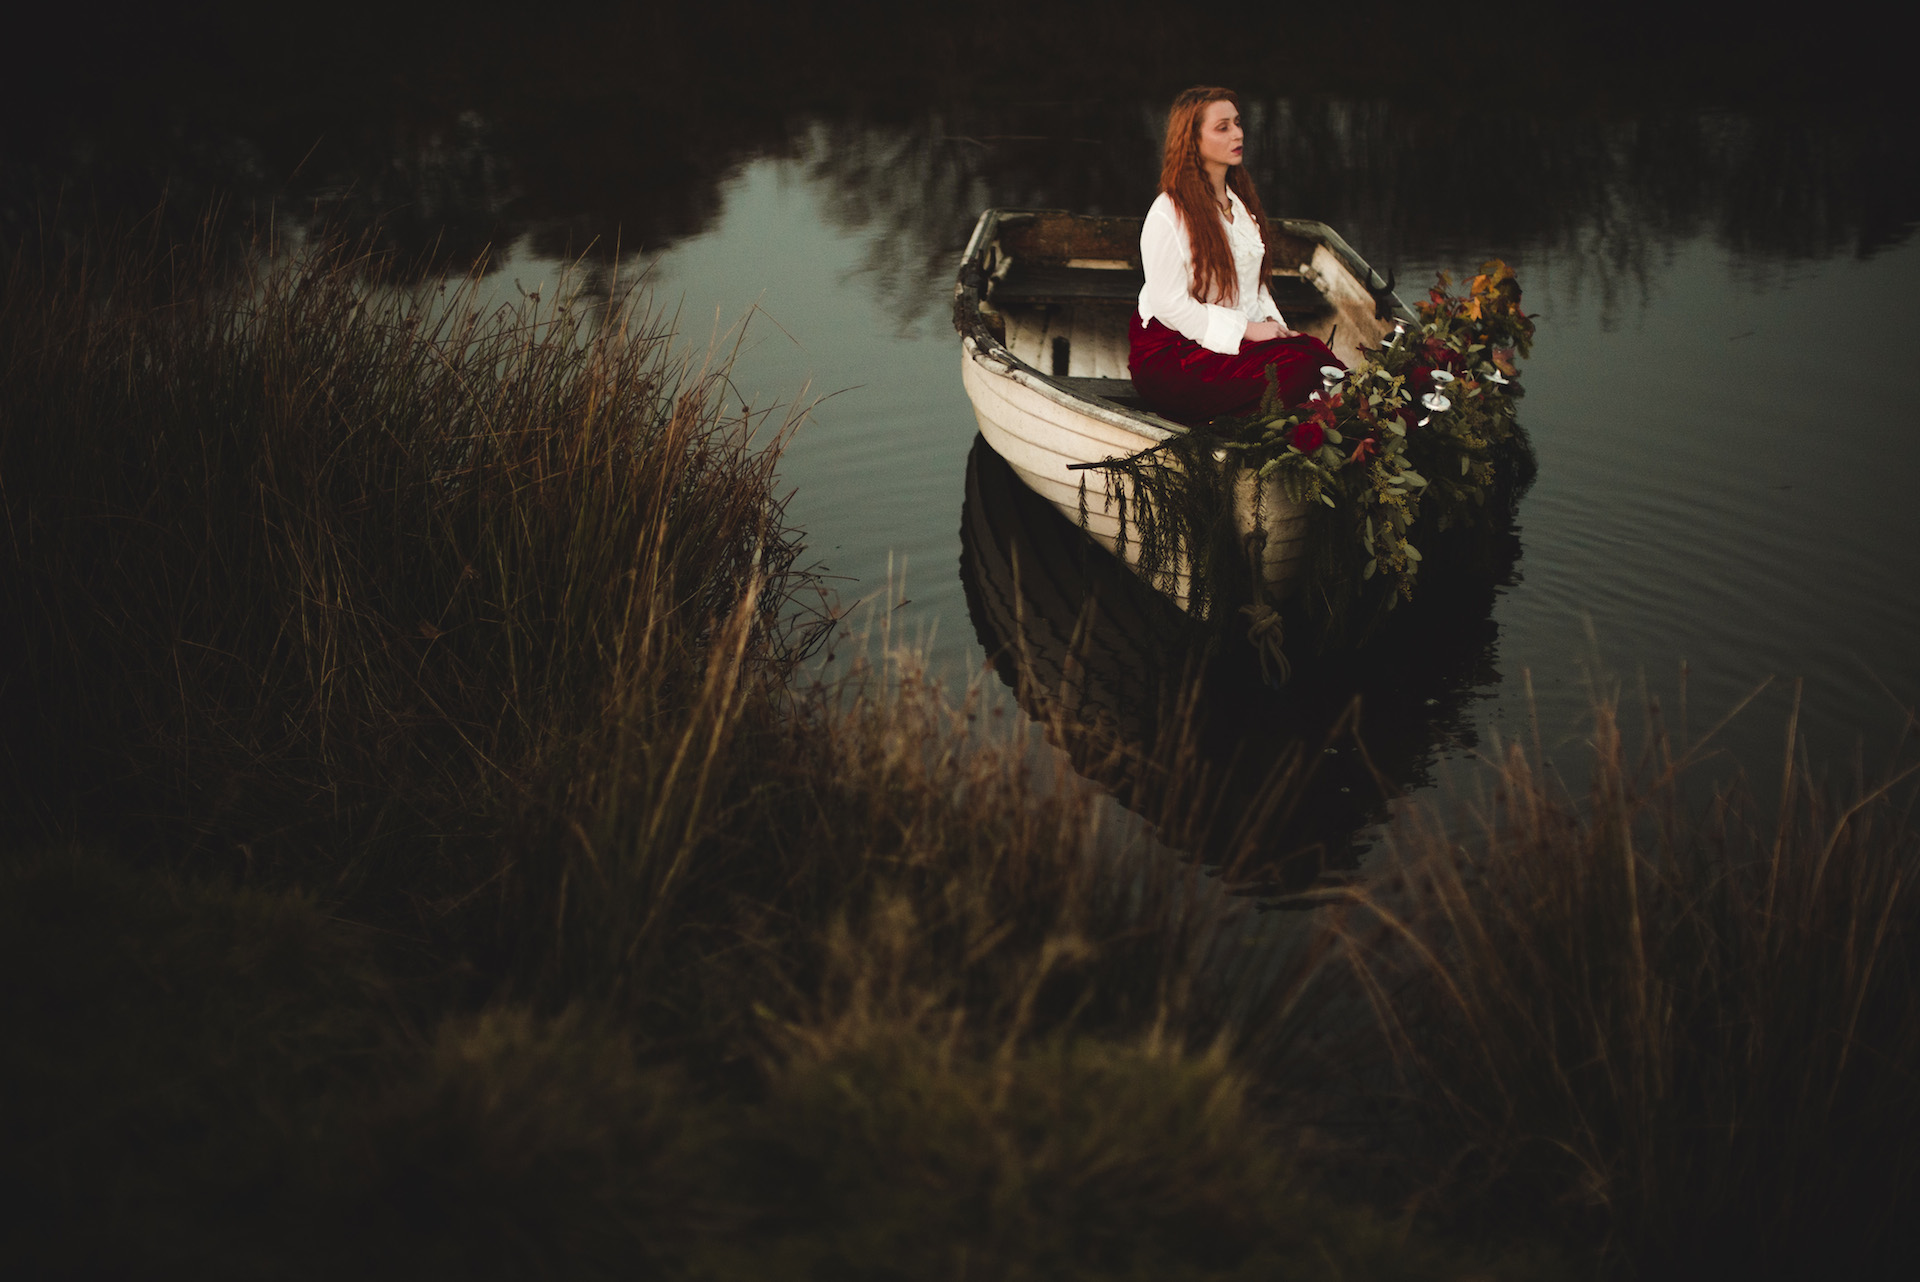 Lady of Shalott - Poetic